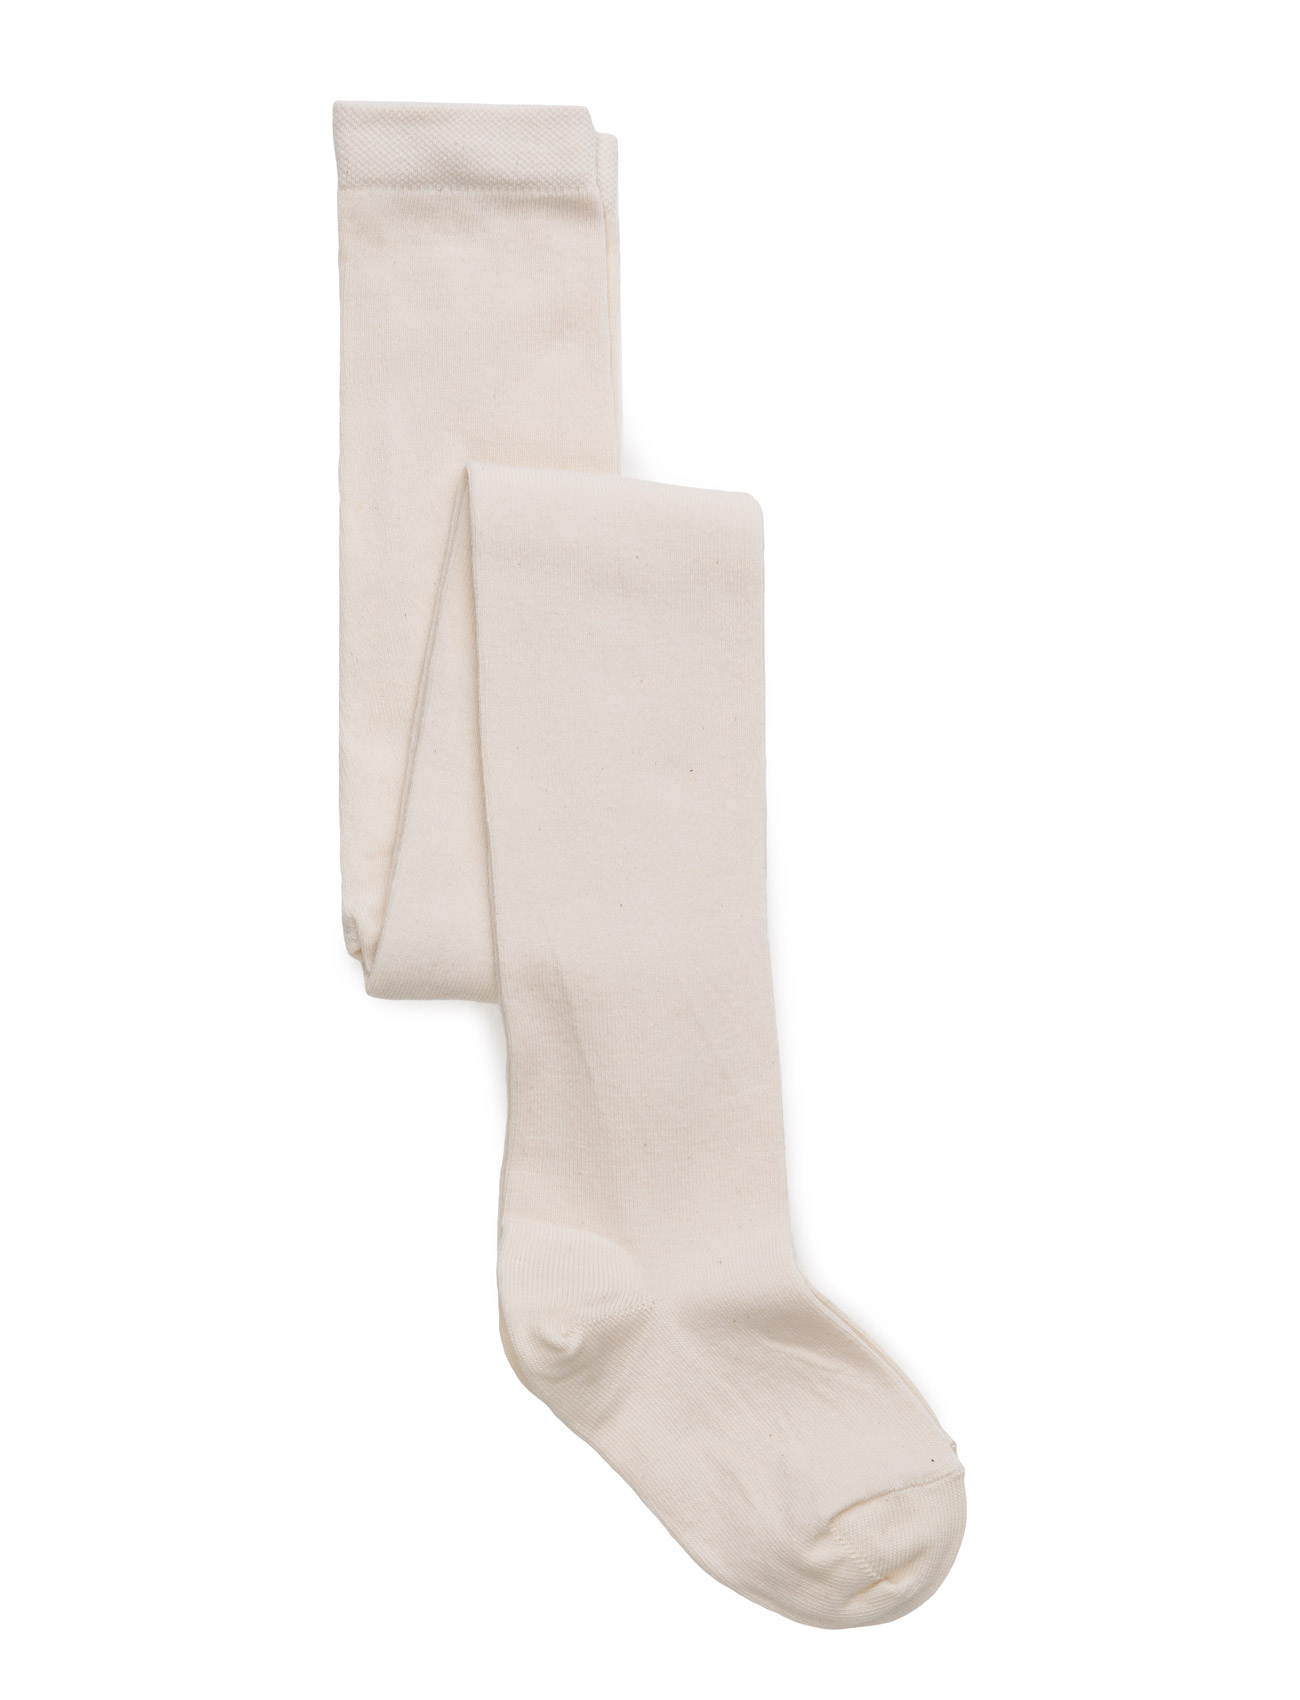 Image of Tight, Plain Colour Girls Socks & Tights Tights Creme MELTON (2382480755)